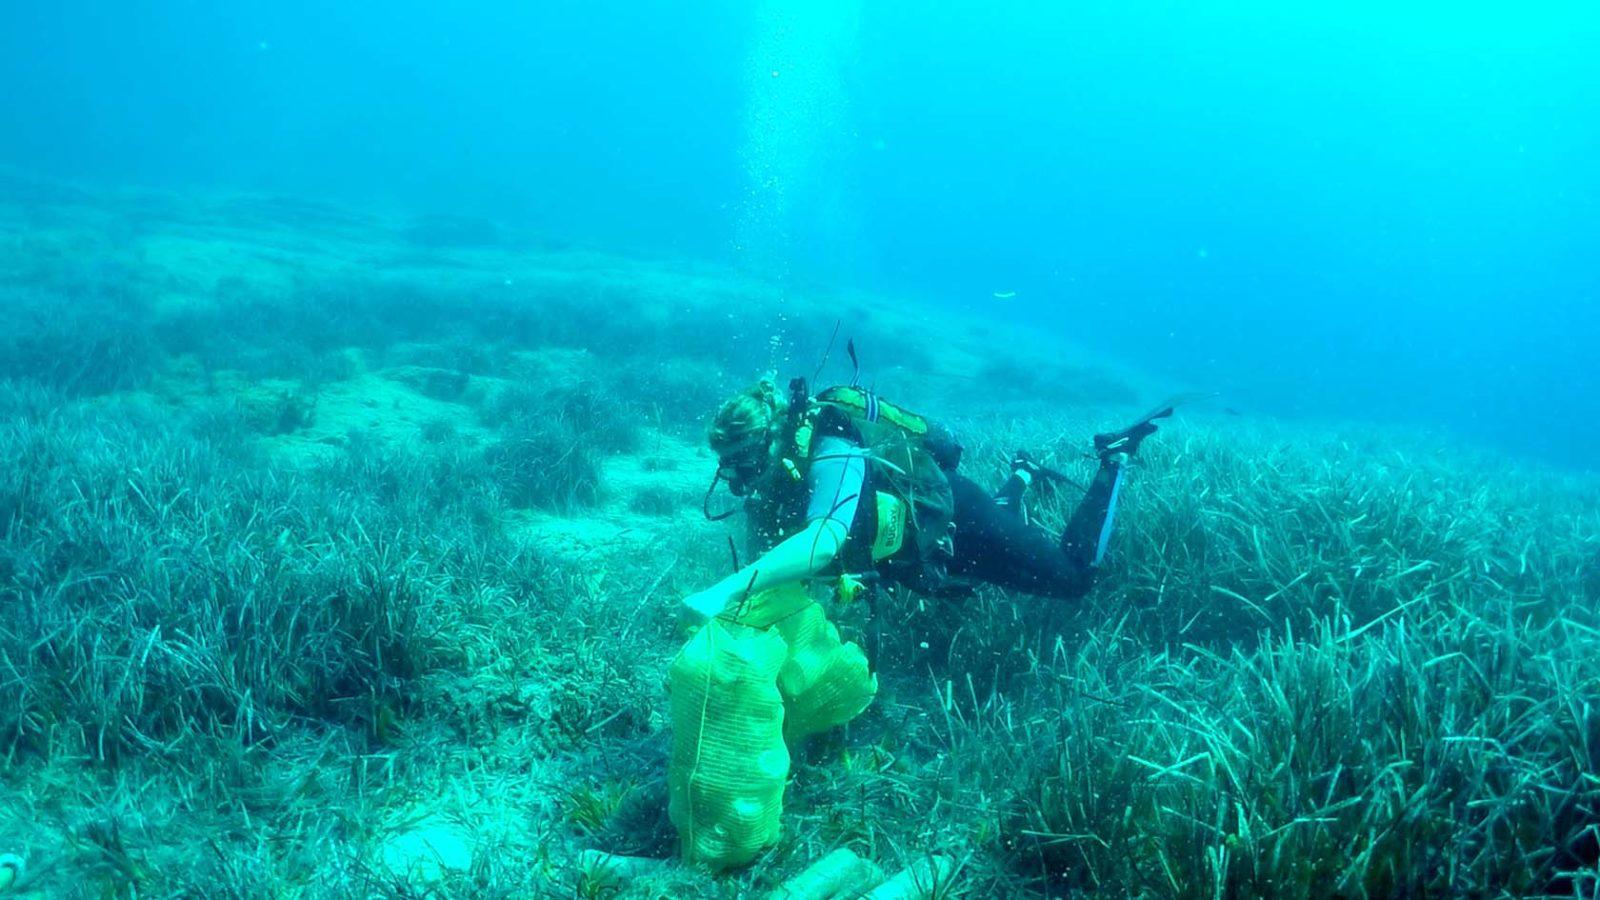 Aegean Rebreath Δράση Αντίπαρος Φωτογραφίες